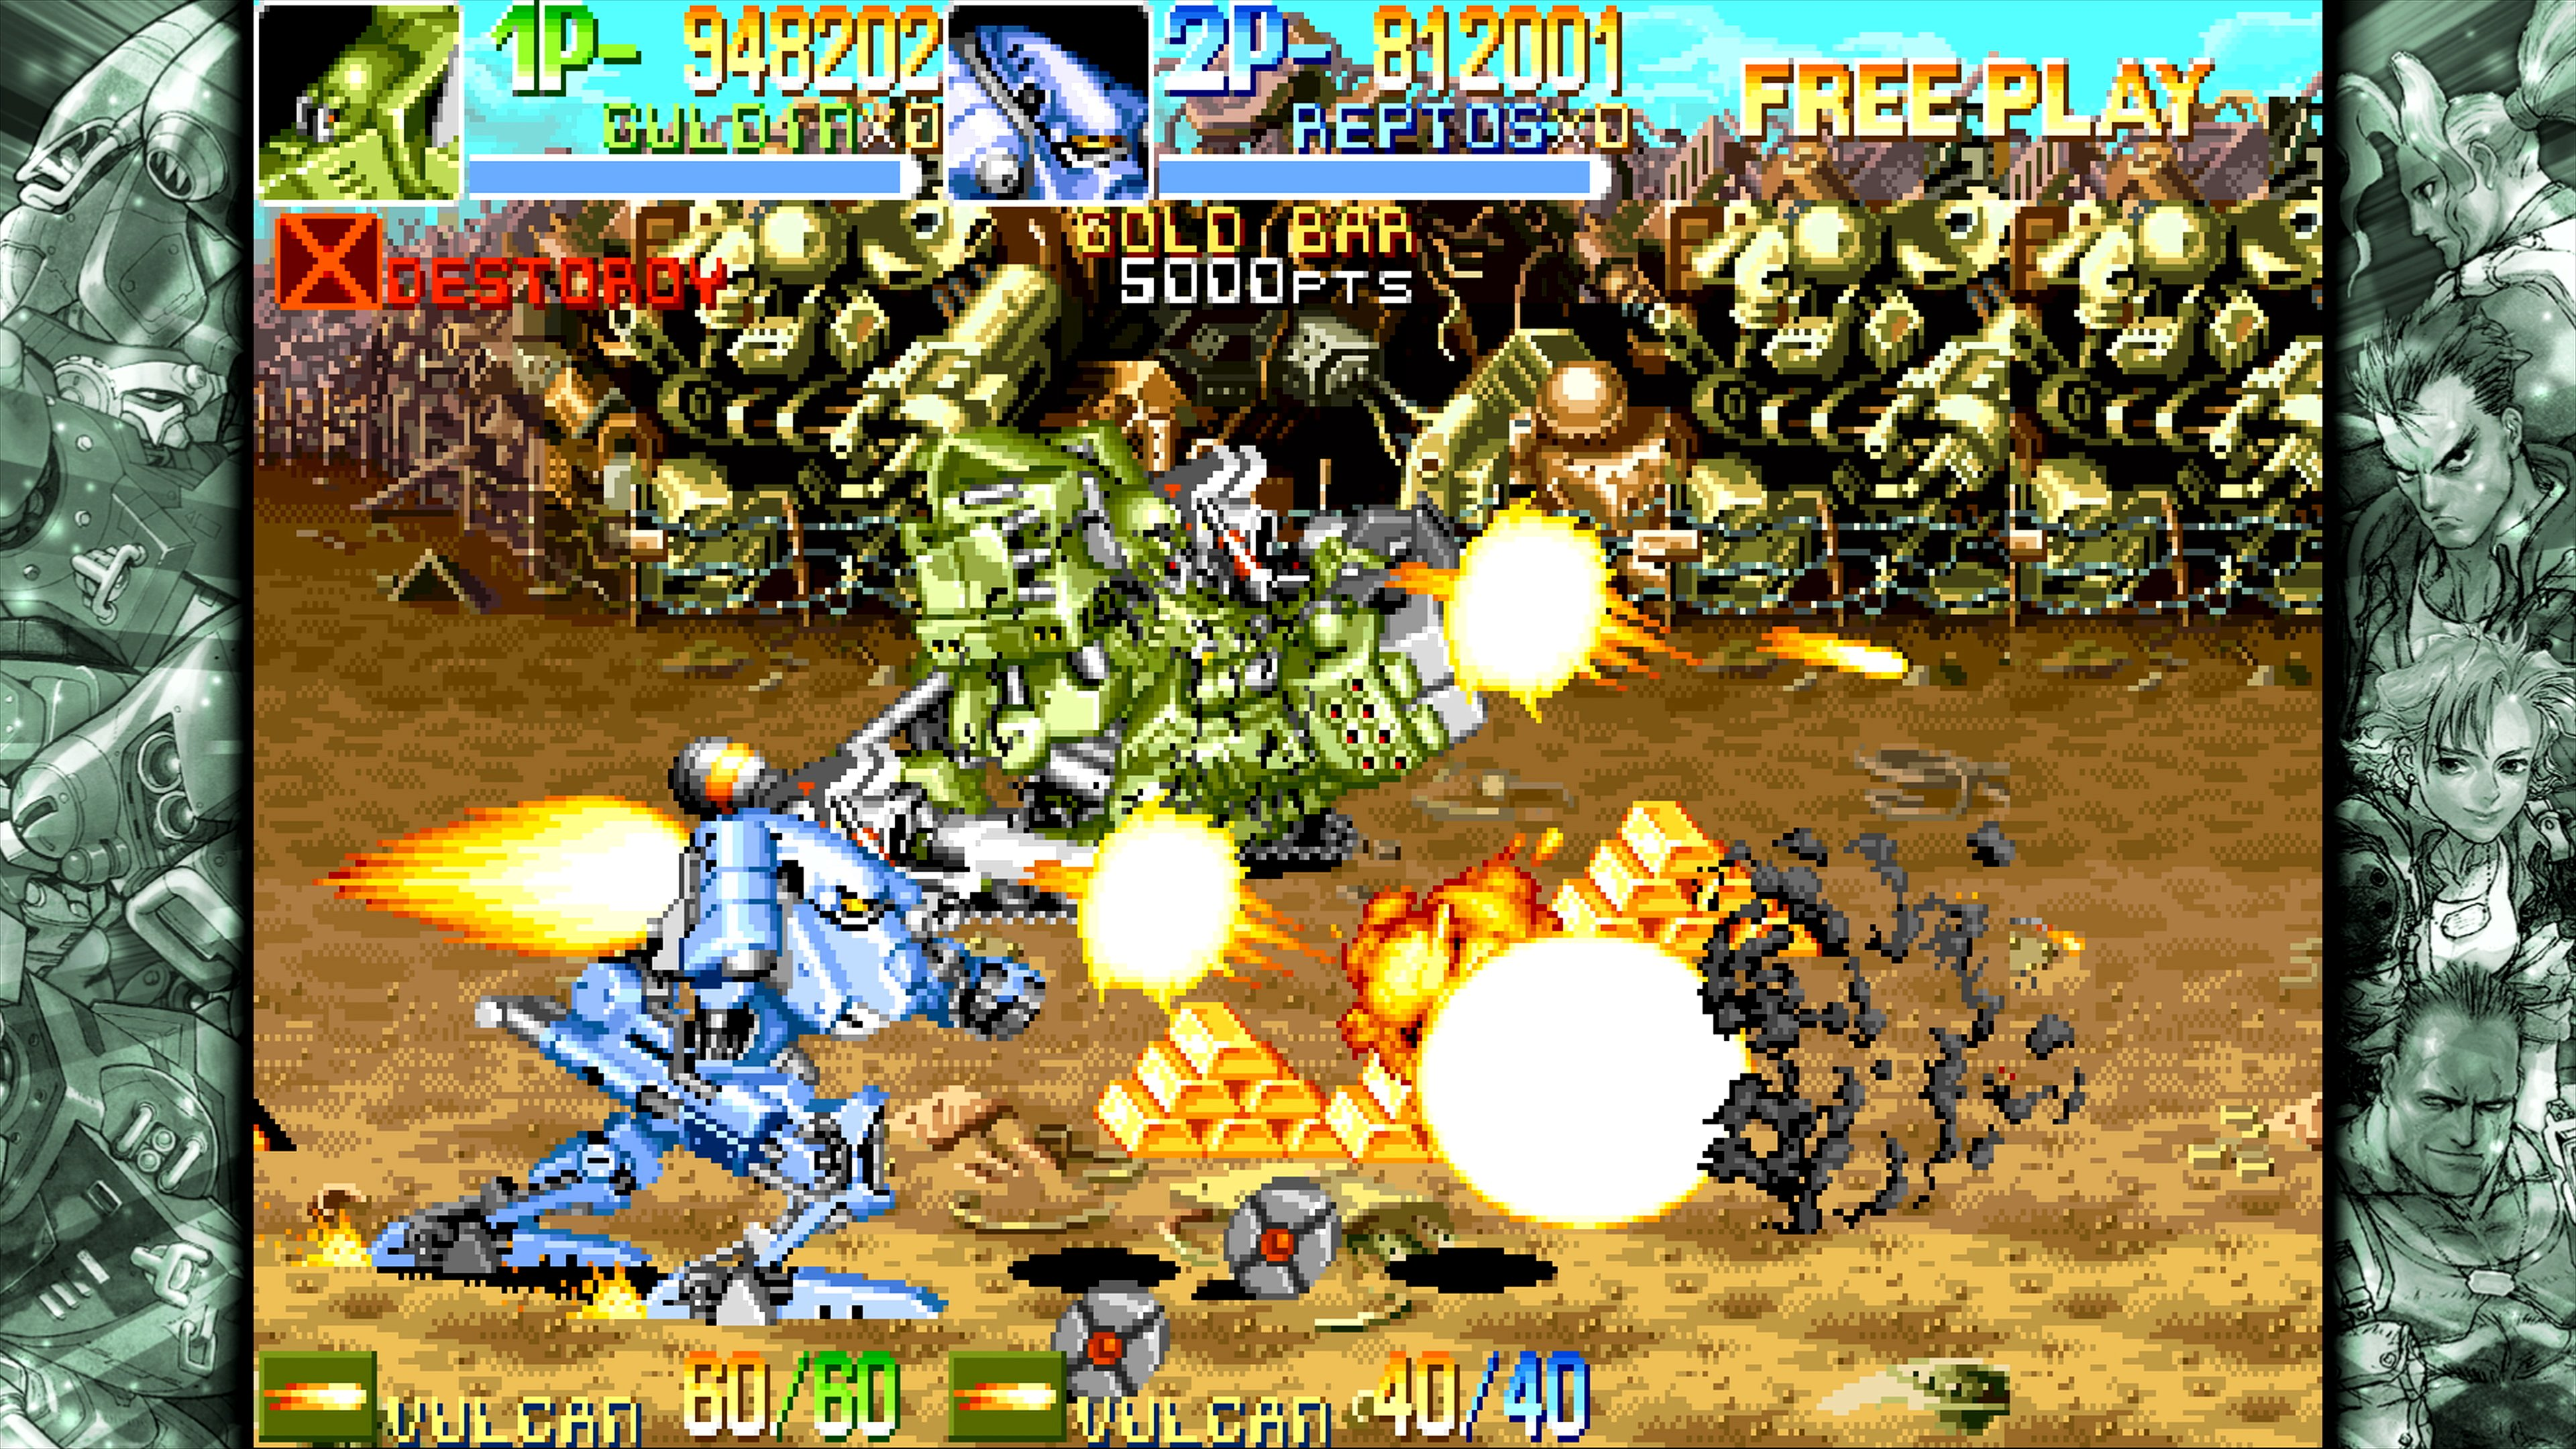 Powered_Gear_Armored_Warriors_3